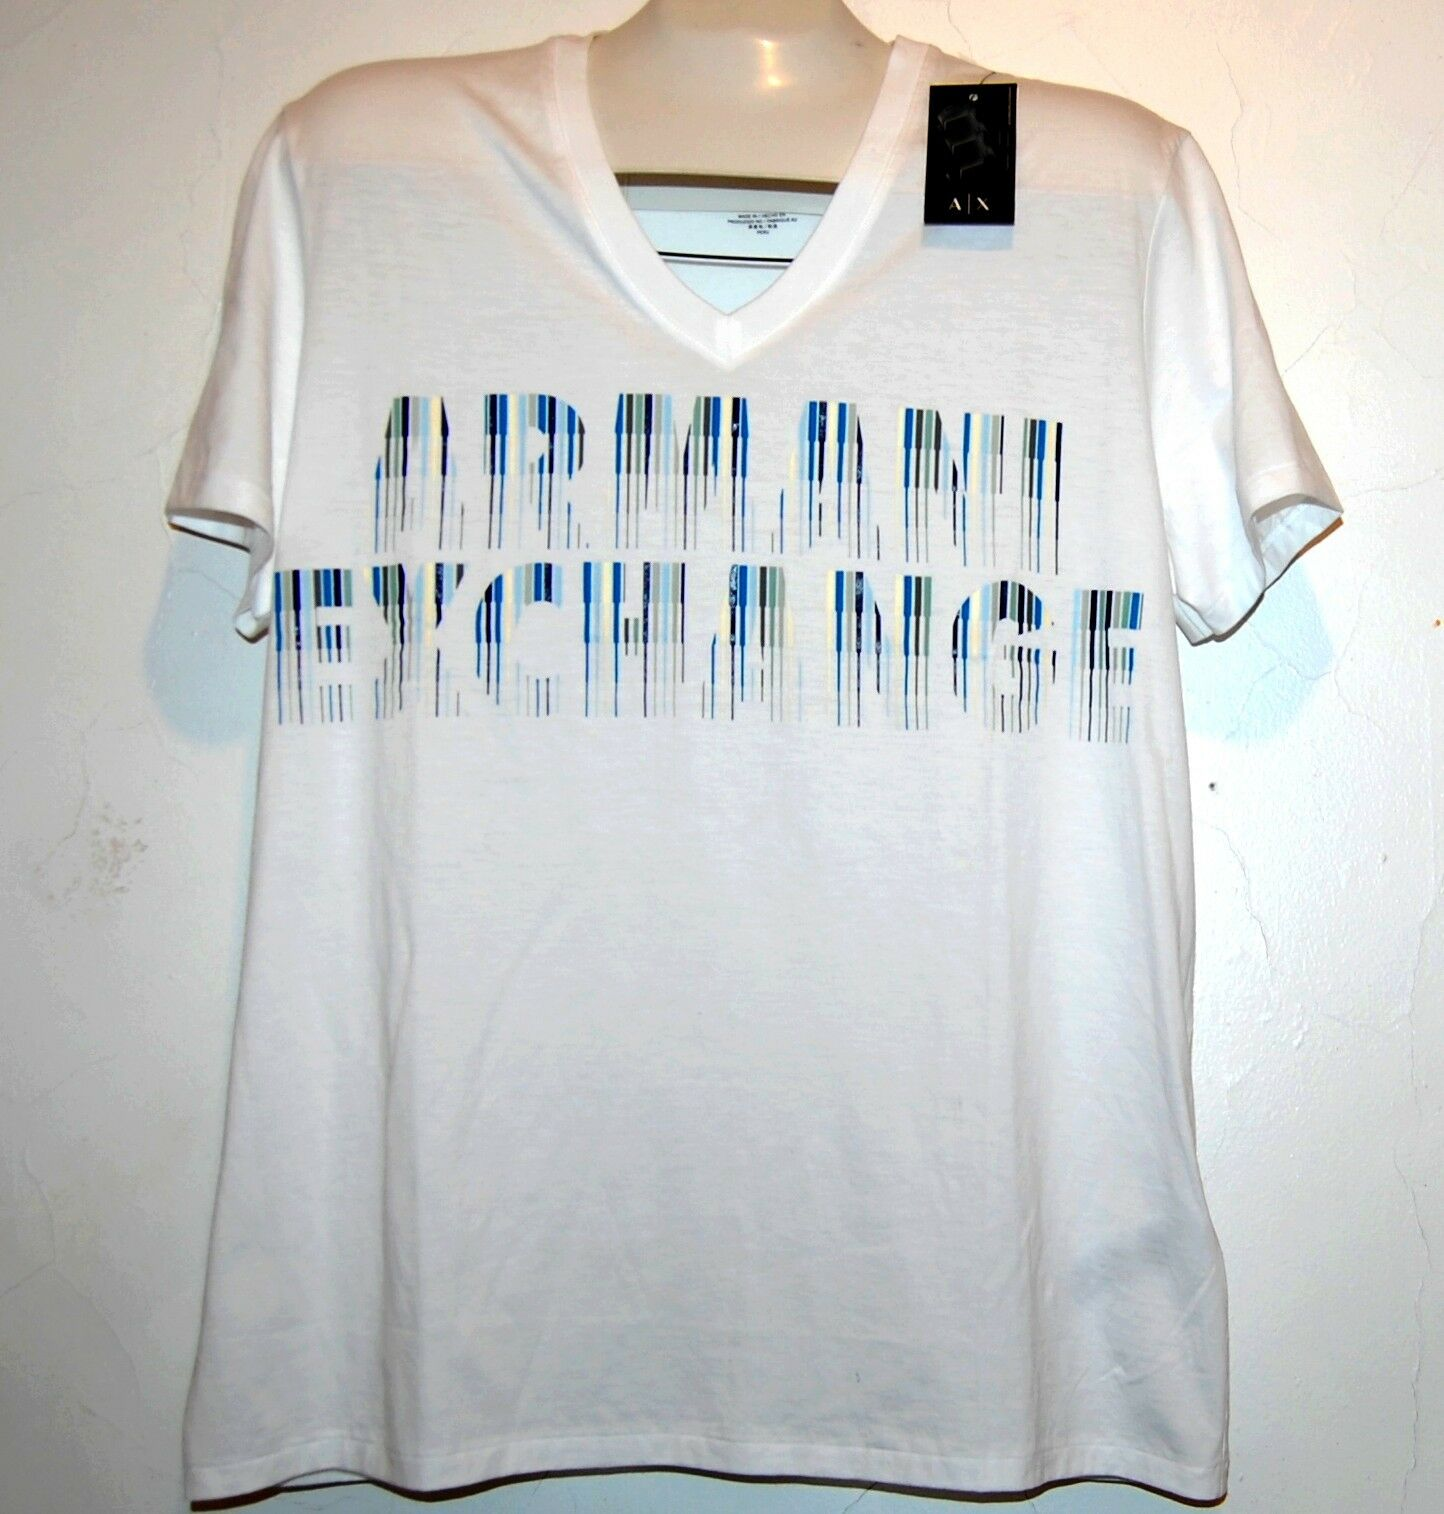 Armani Exchange White bluee Logo Cotton Short Sleeve Men's T-Shirt Size XL NEW